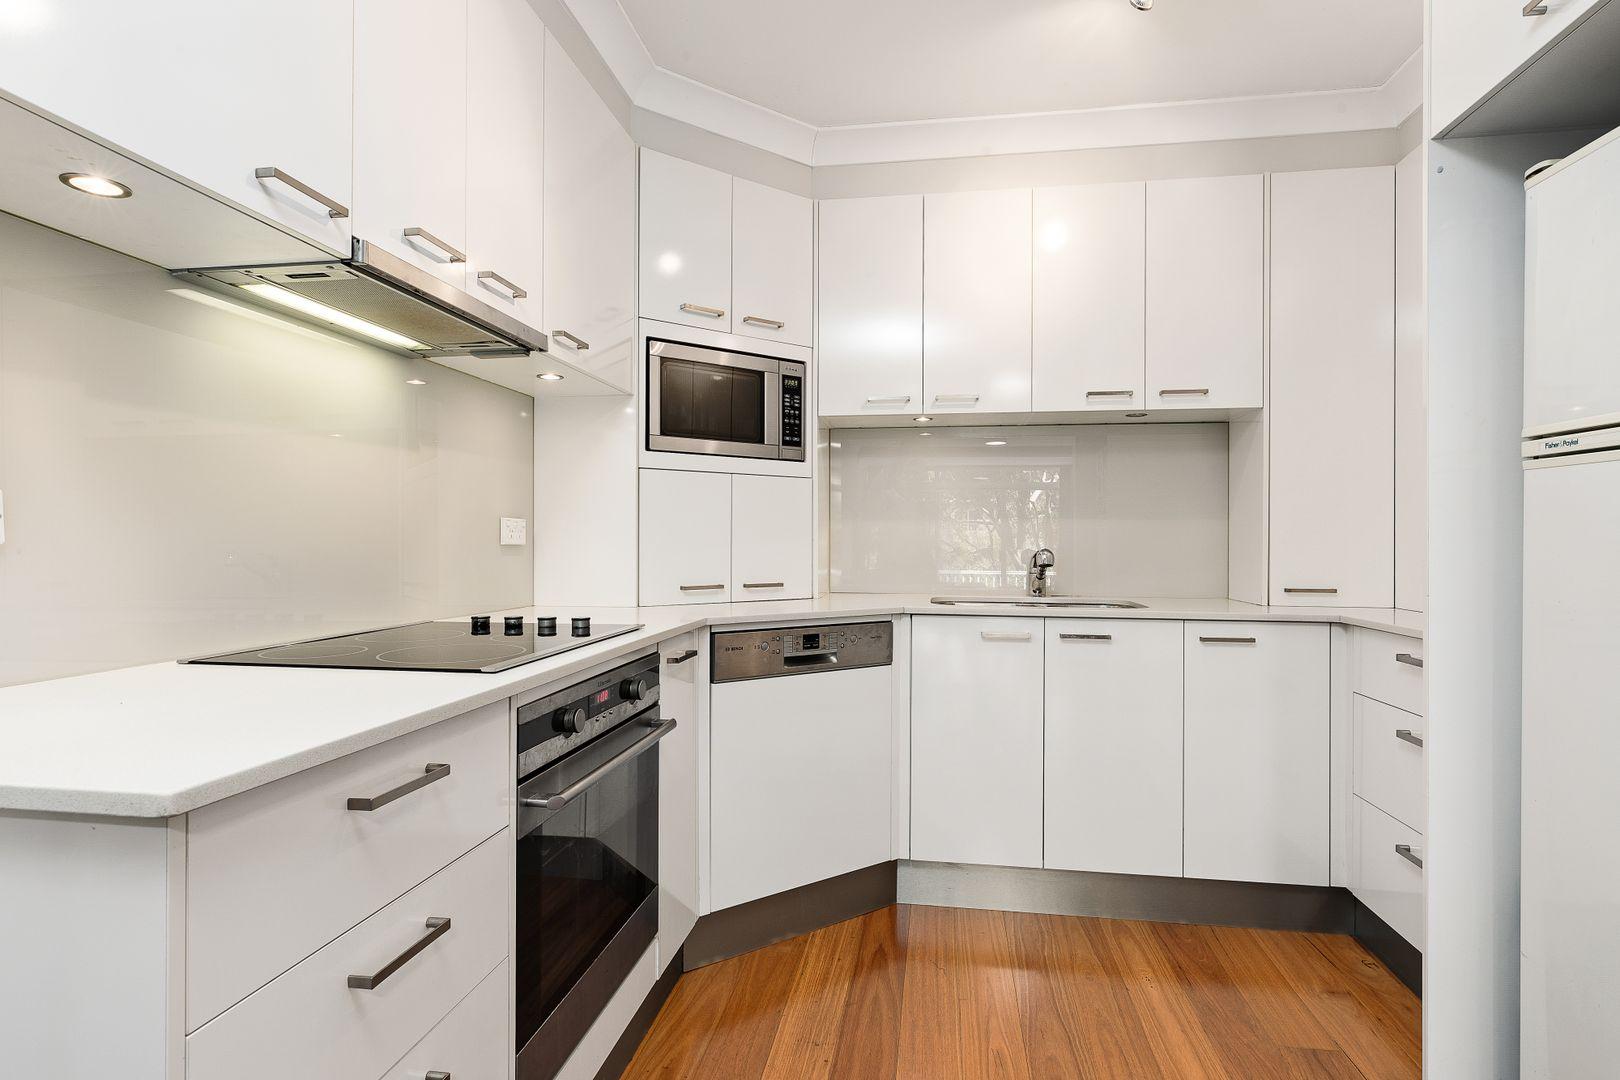 10/13-15 Wharf Road, Gladesville NSW 2111, Image 1